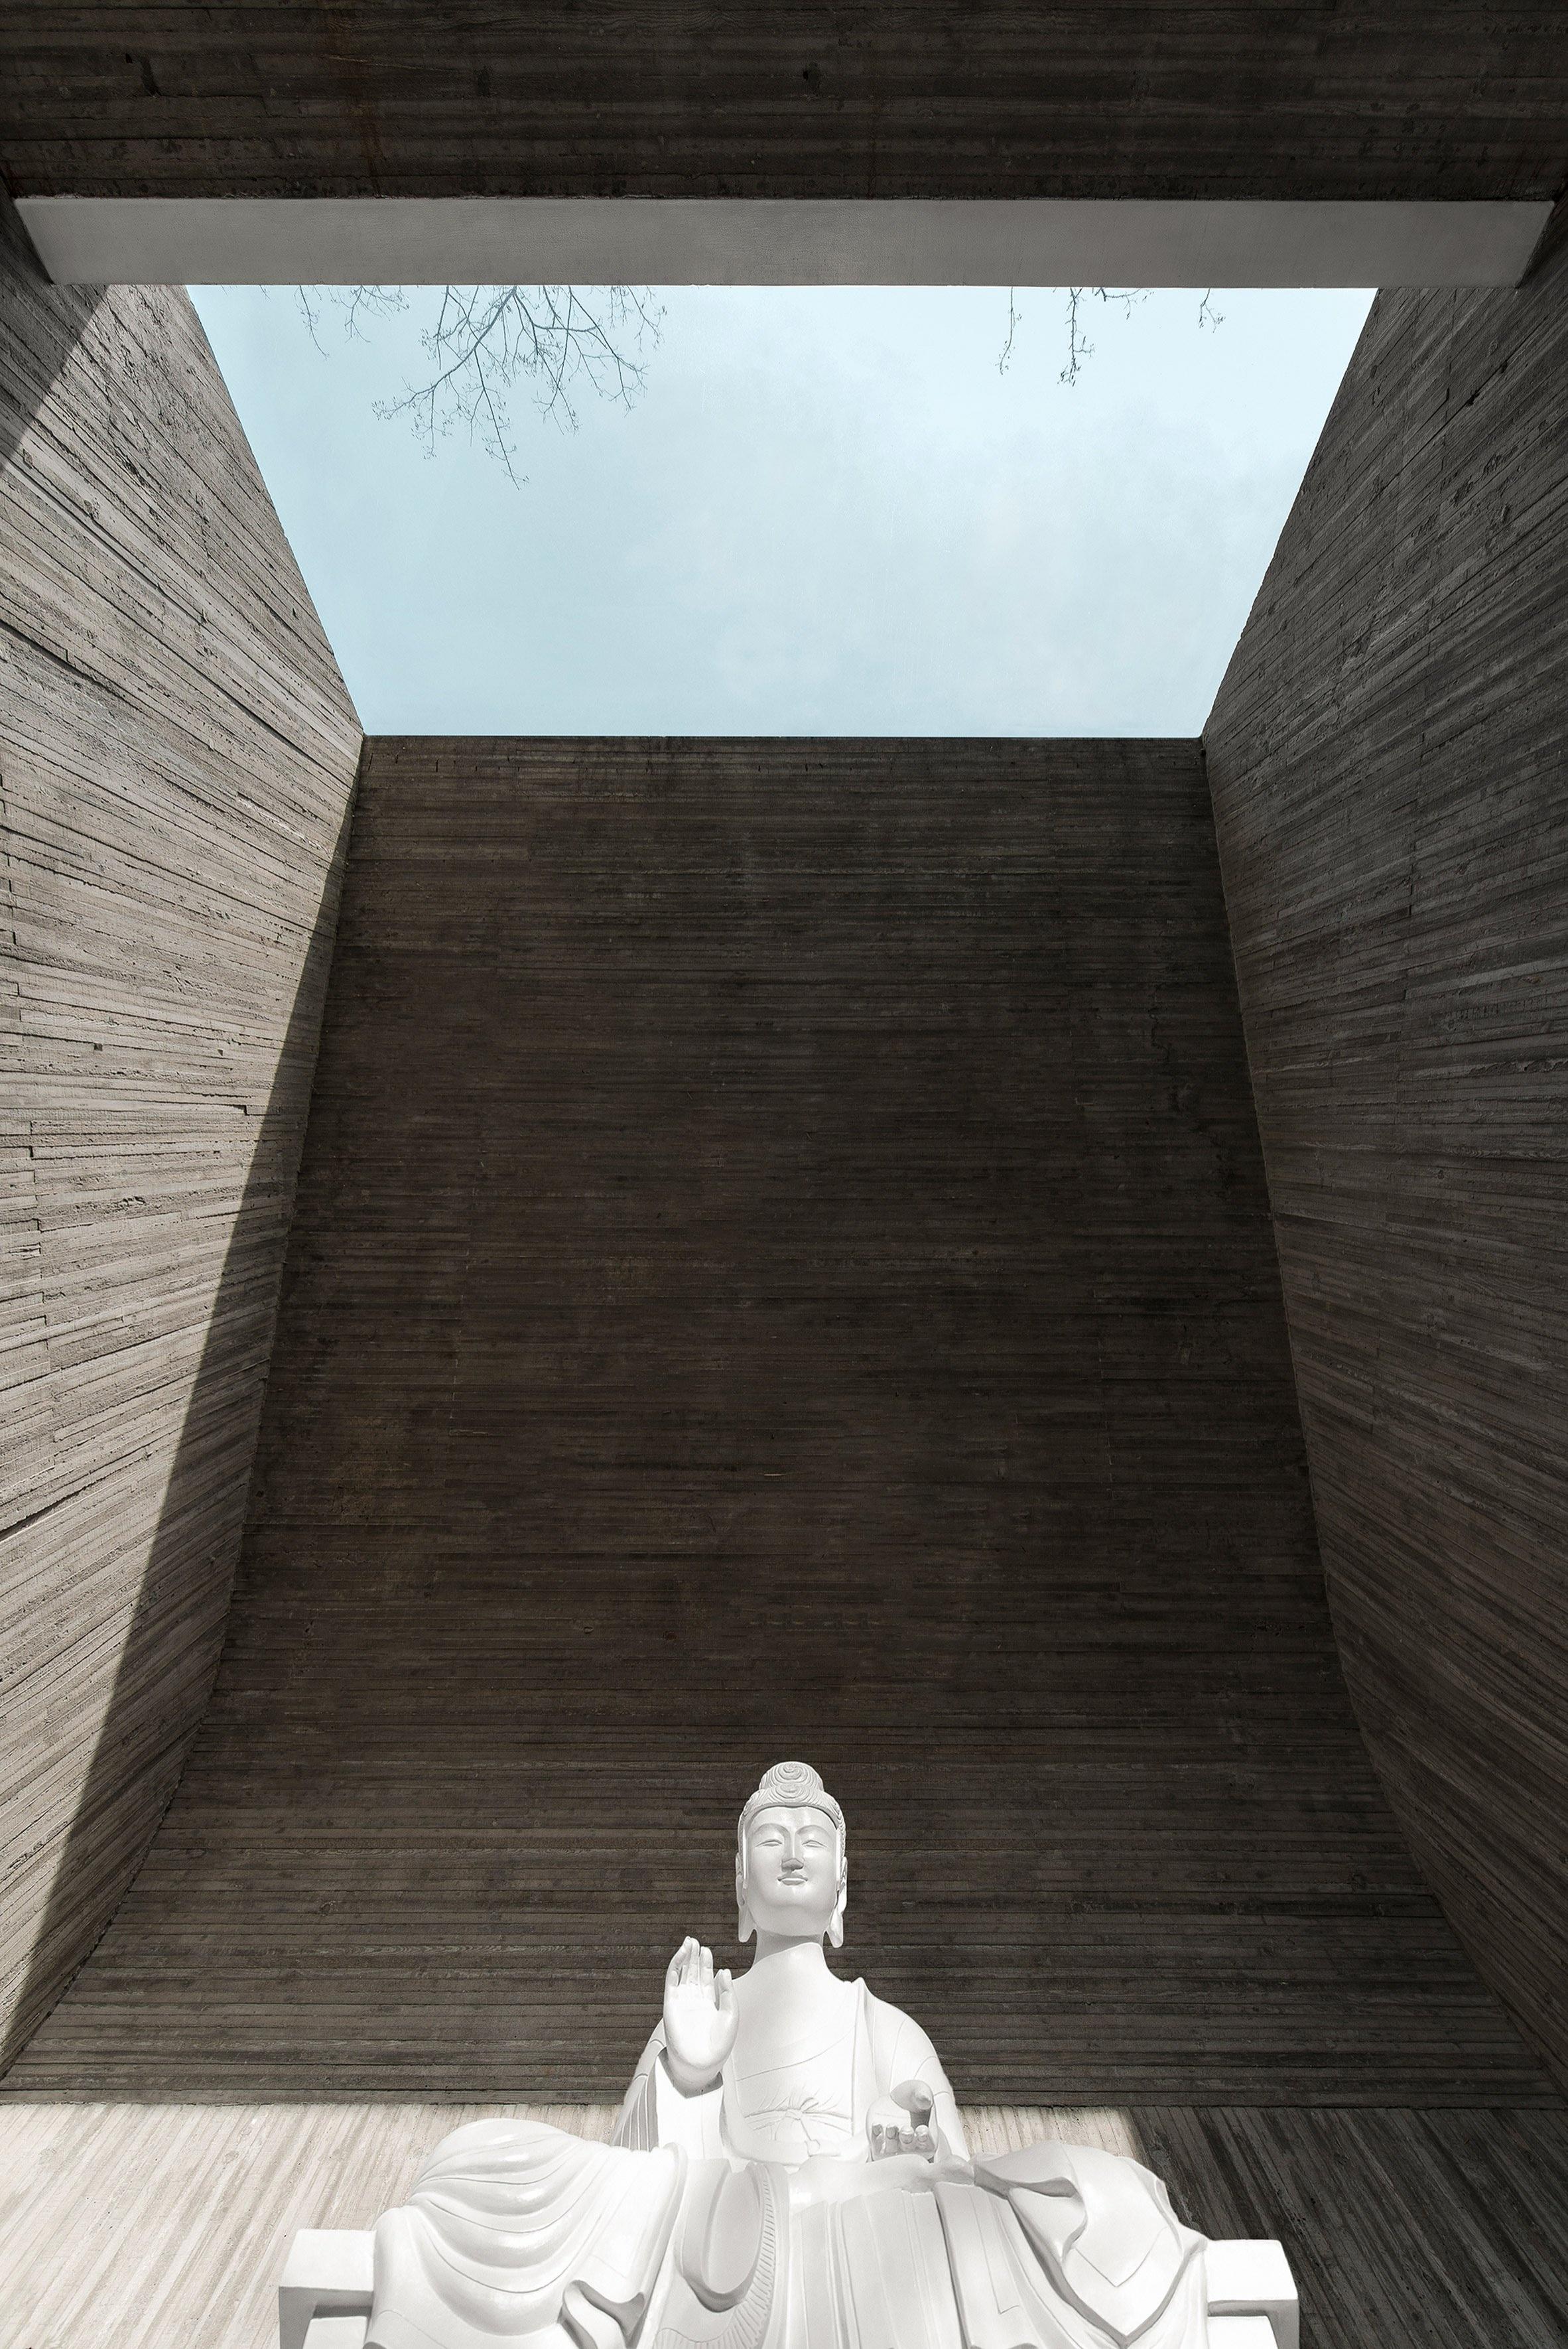 waterside-buddist-shrine-archstudio-architecture-cultural-china_dezeen_2364_col_20